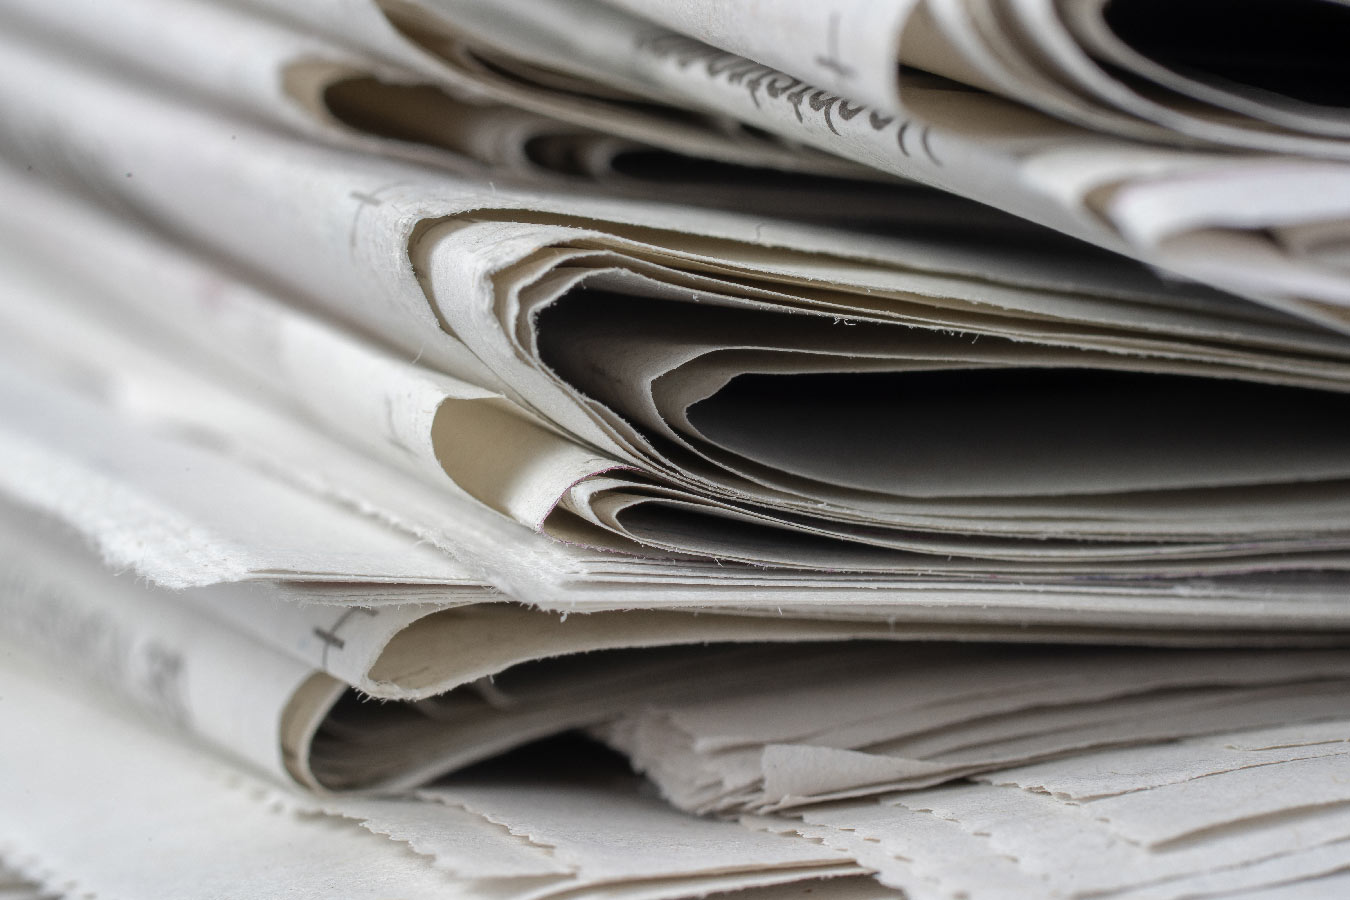 Tas de journaux